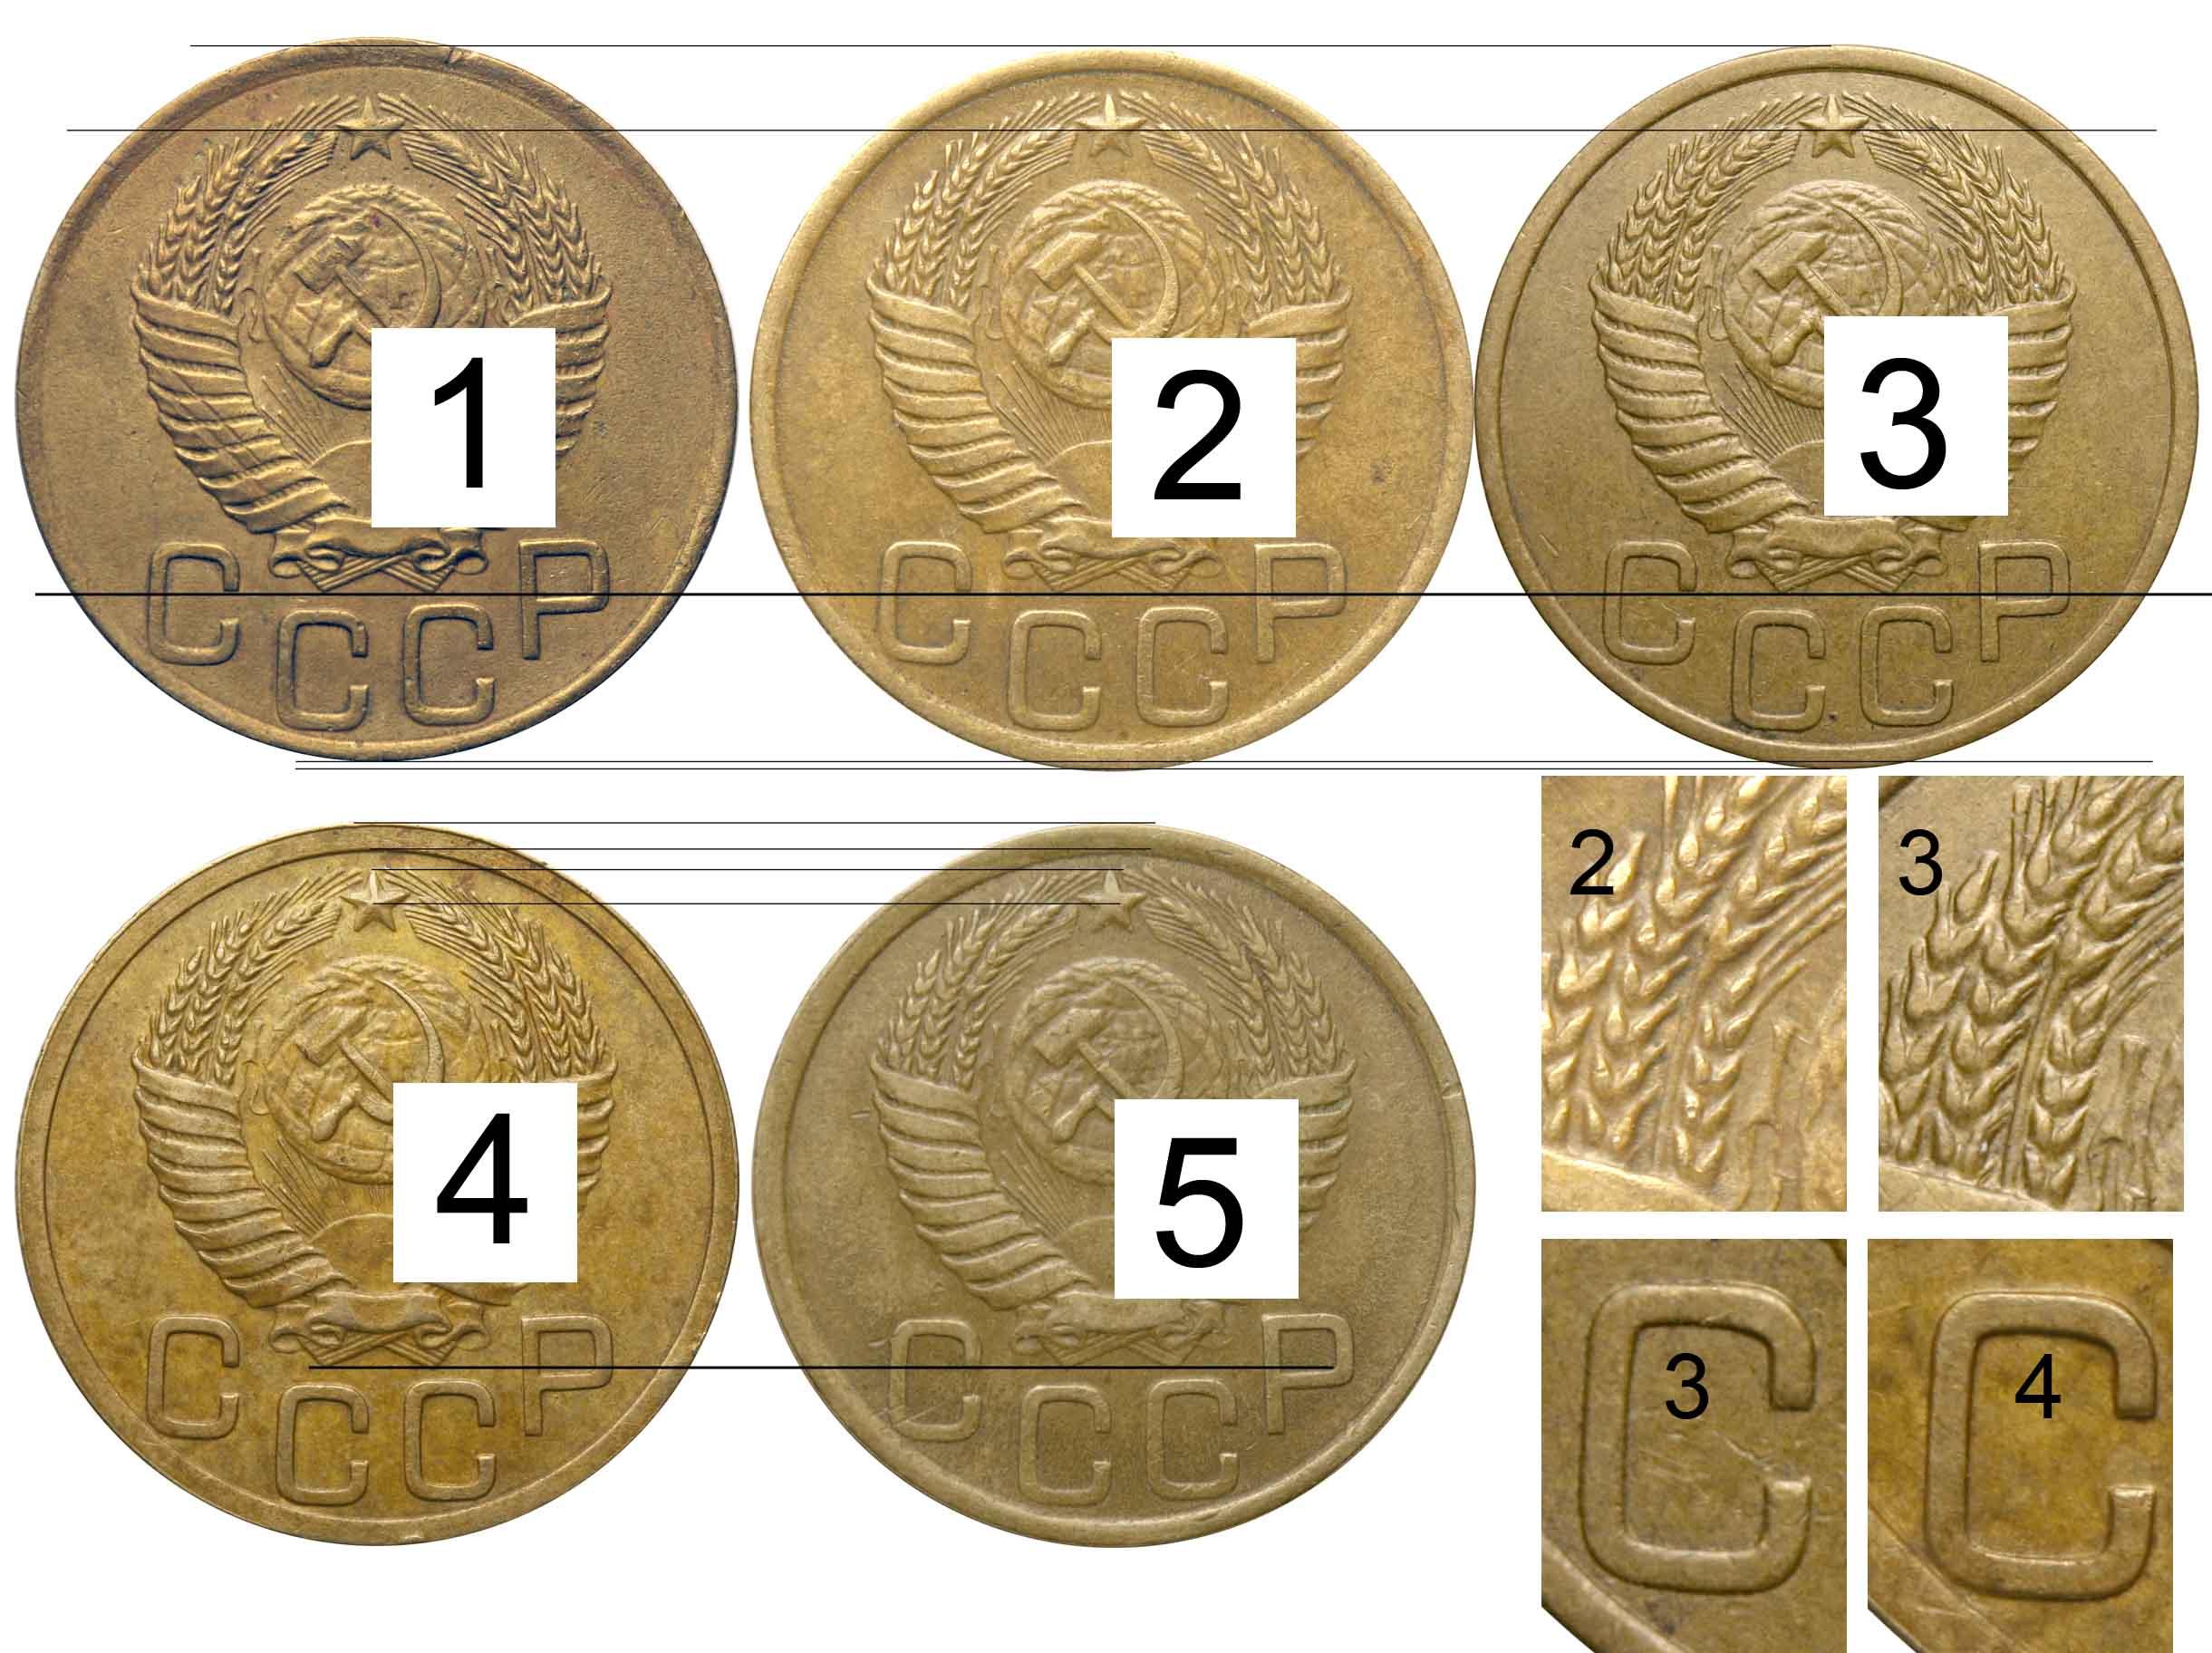 Разновидности аверса iv (по ф=3.1) 3 копеек 1949-52 - монеты.